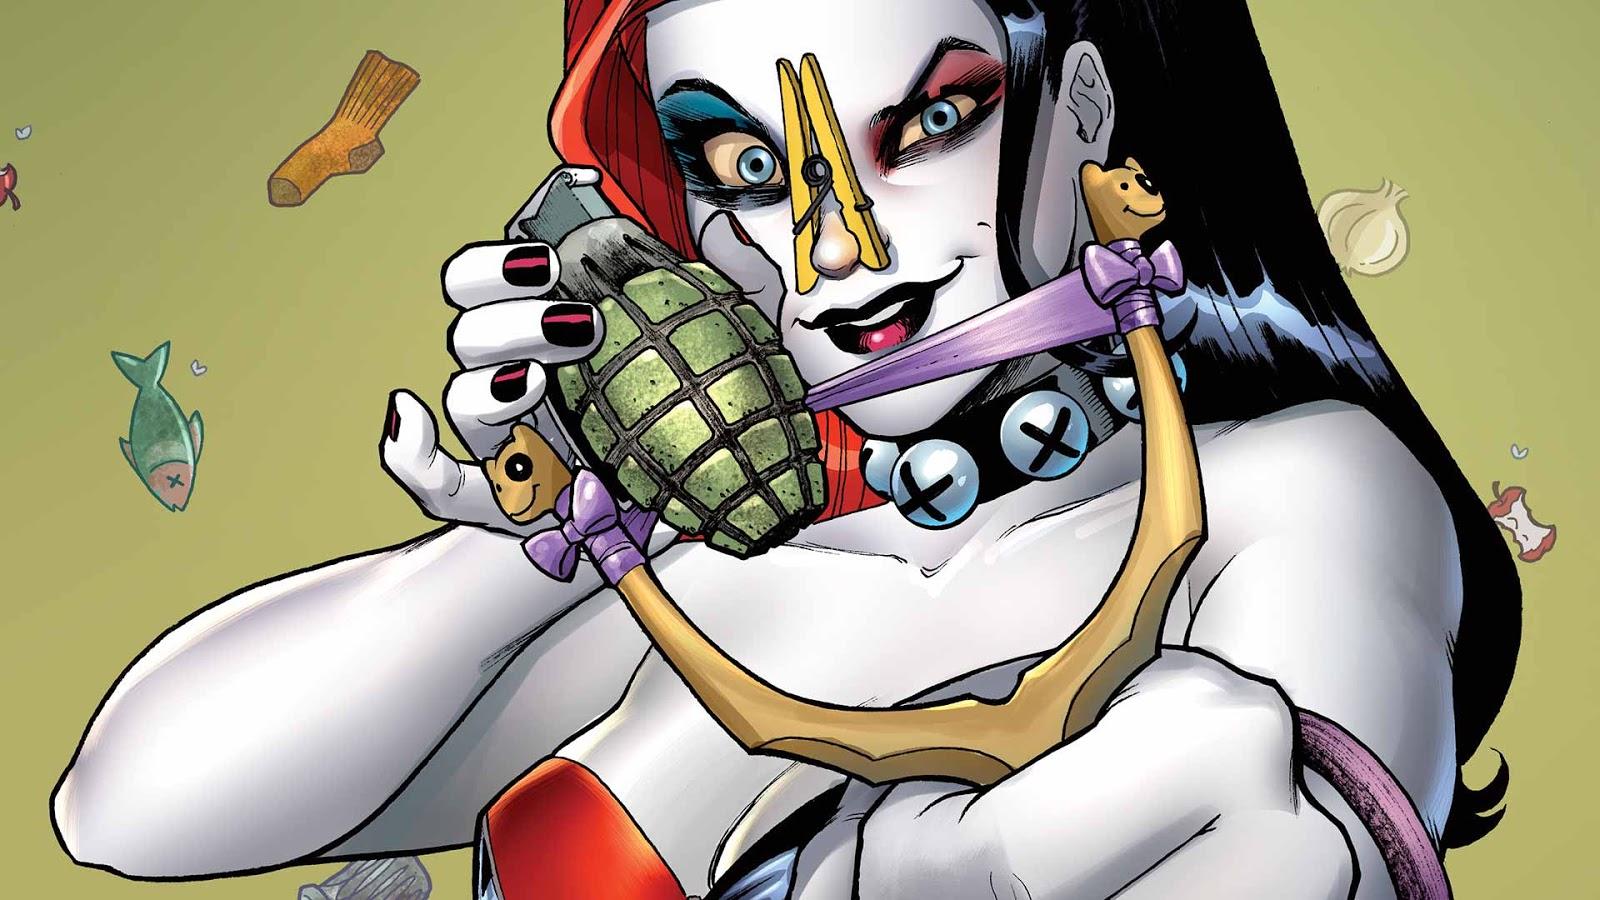 Image Result For Harlequin And Joker